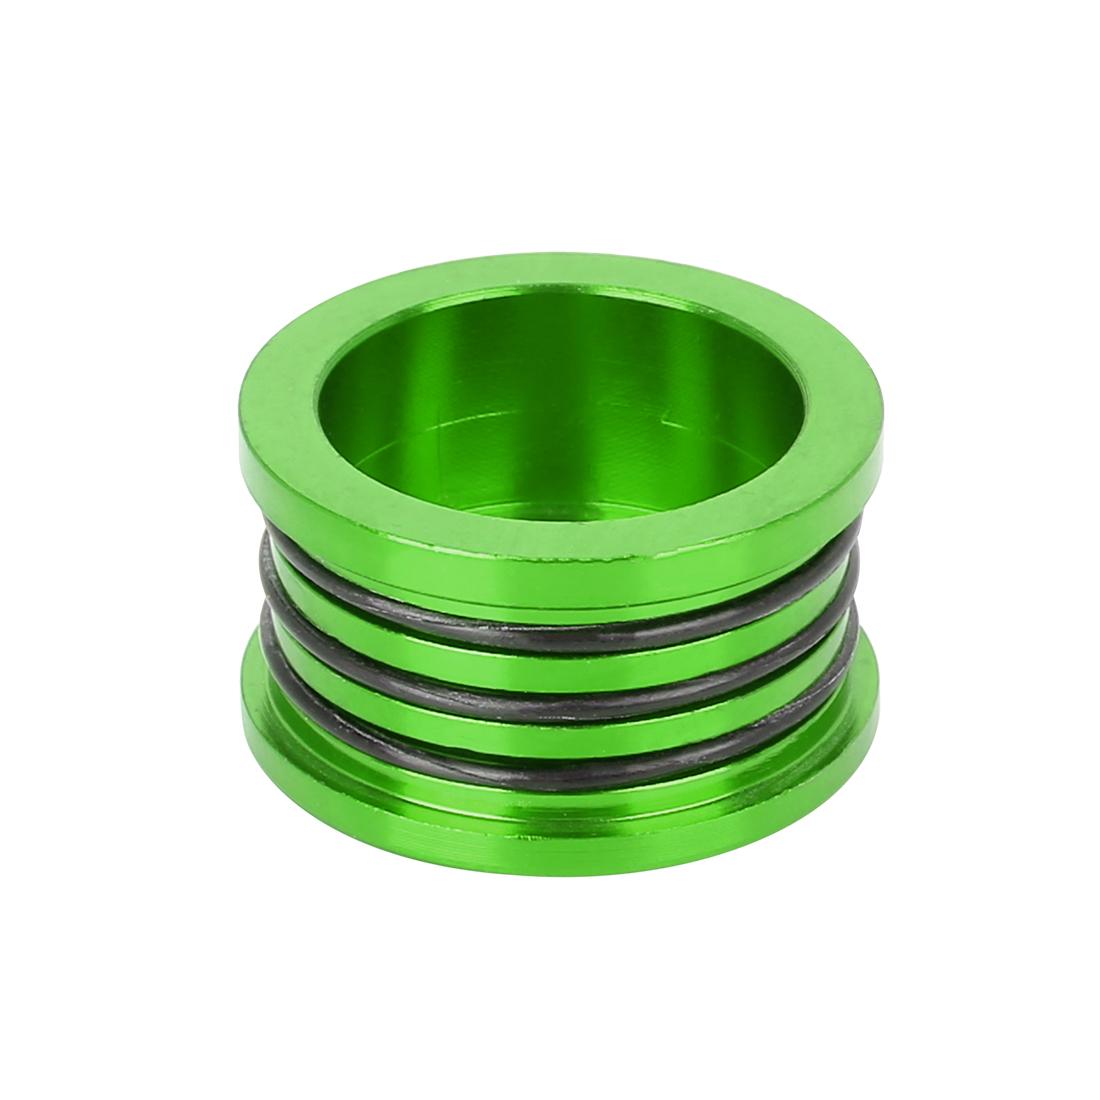 Aluminum Alloy Camshaft Oil Seal Cover Cap O Ring Plug Green for Honda Acura